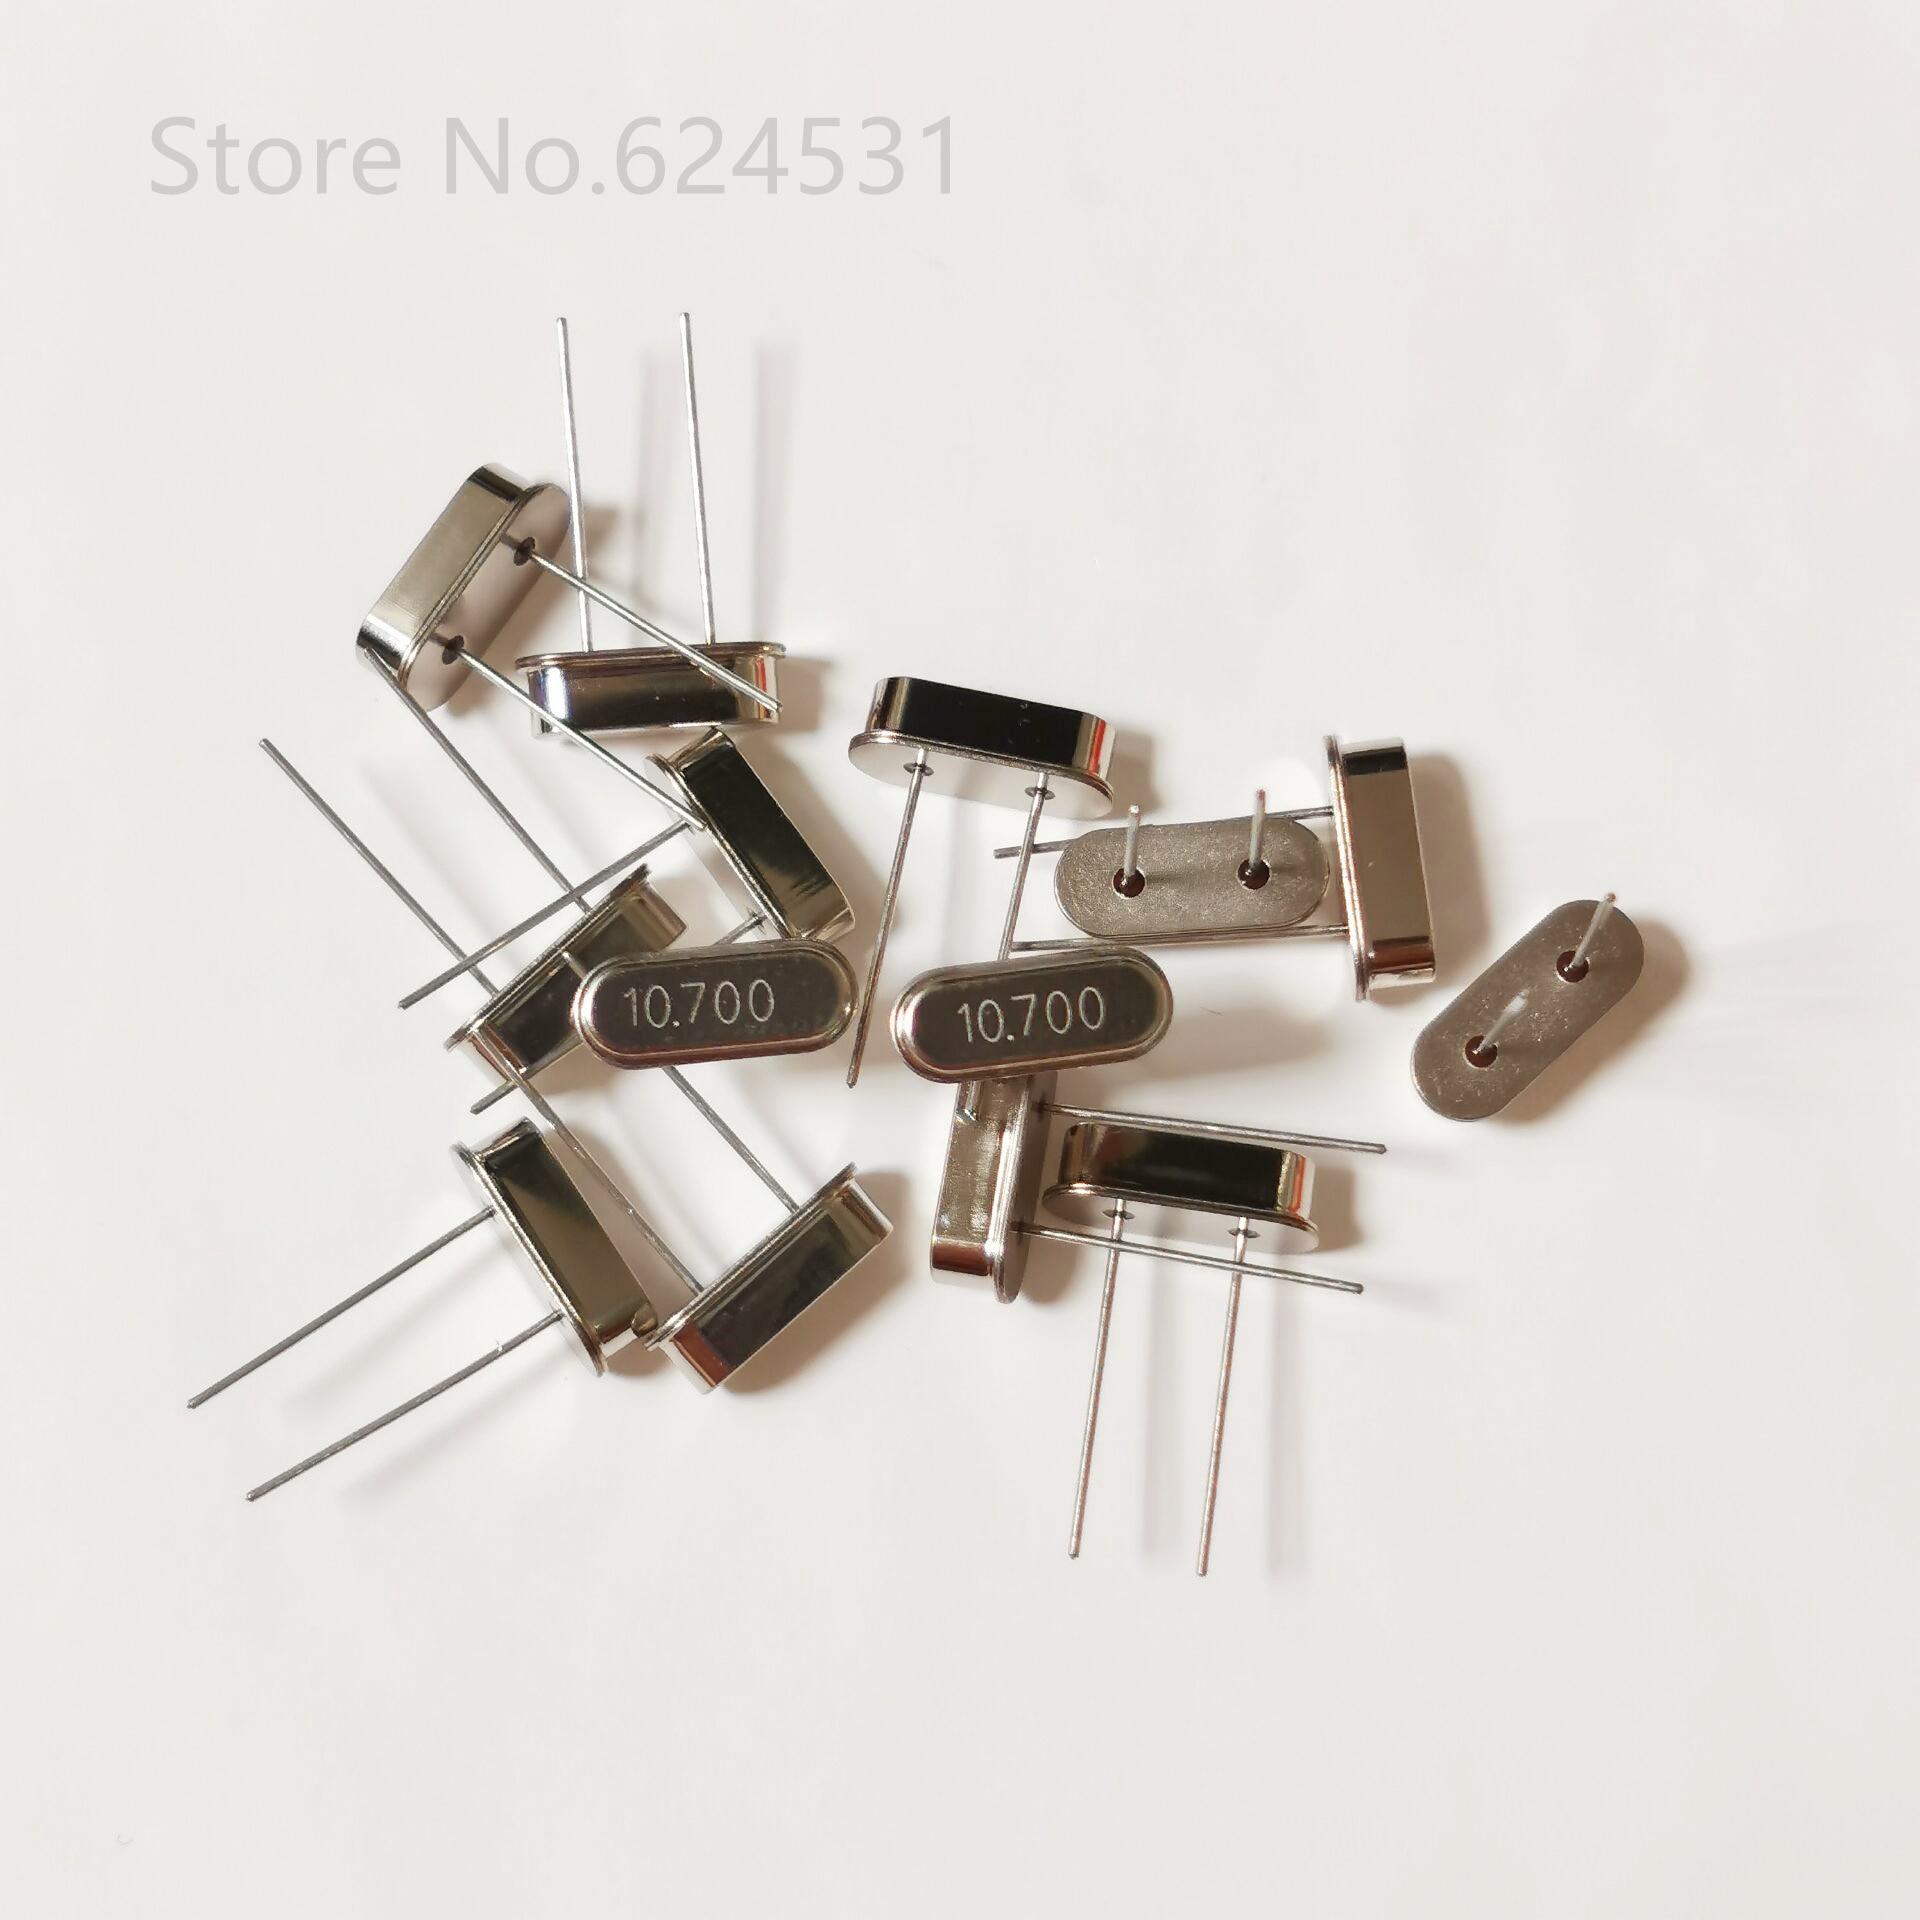 10pcs Quartz Crystal Resonator Crystal Oscillator 10.7M 10.7MHZ HC-49S In-line 2-pin Resonator